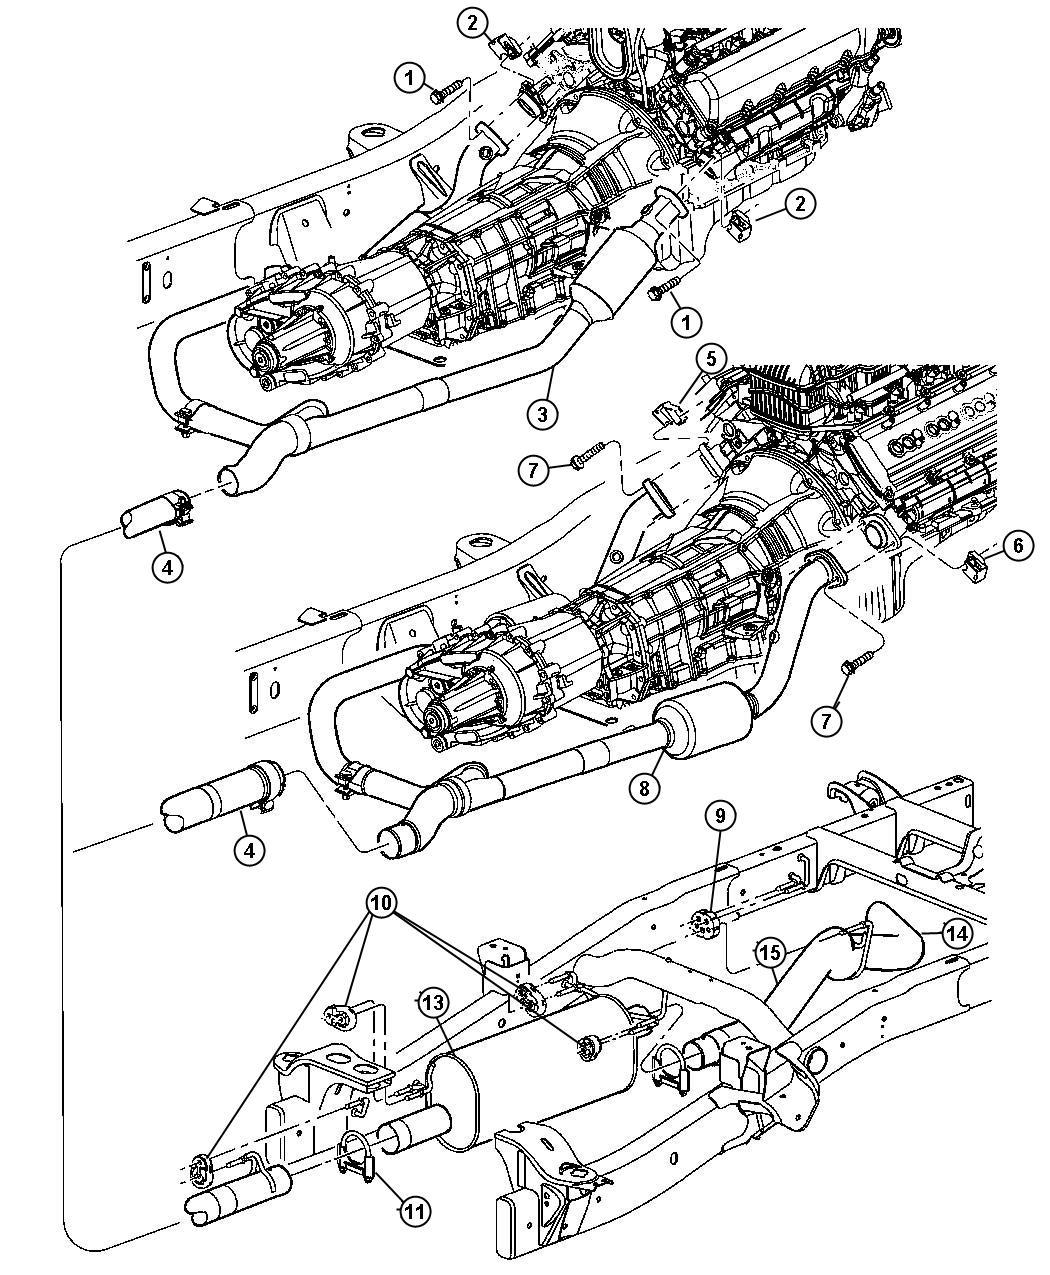 Dodge Ram Tailpipe Exhaust Ekg System